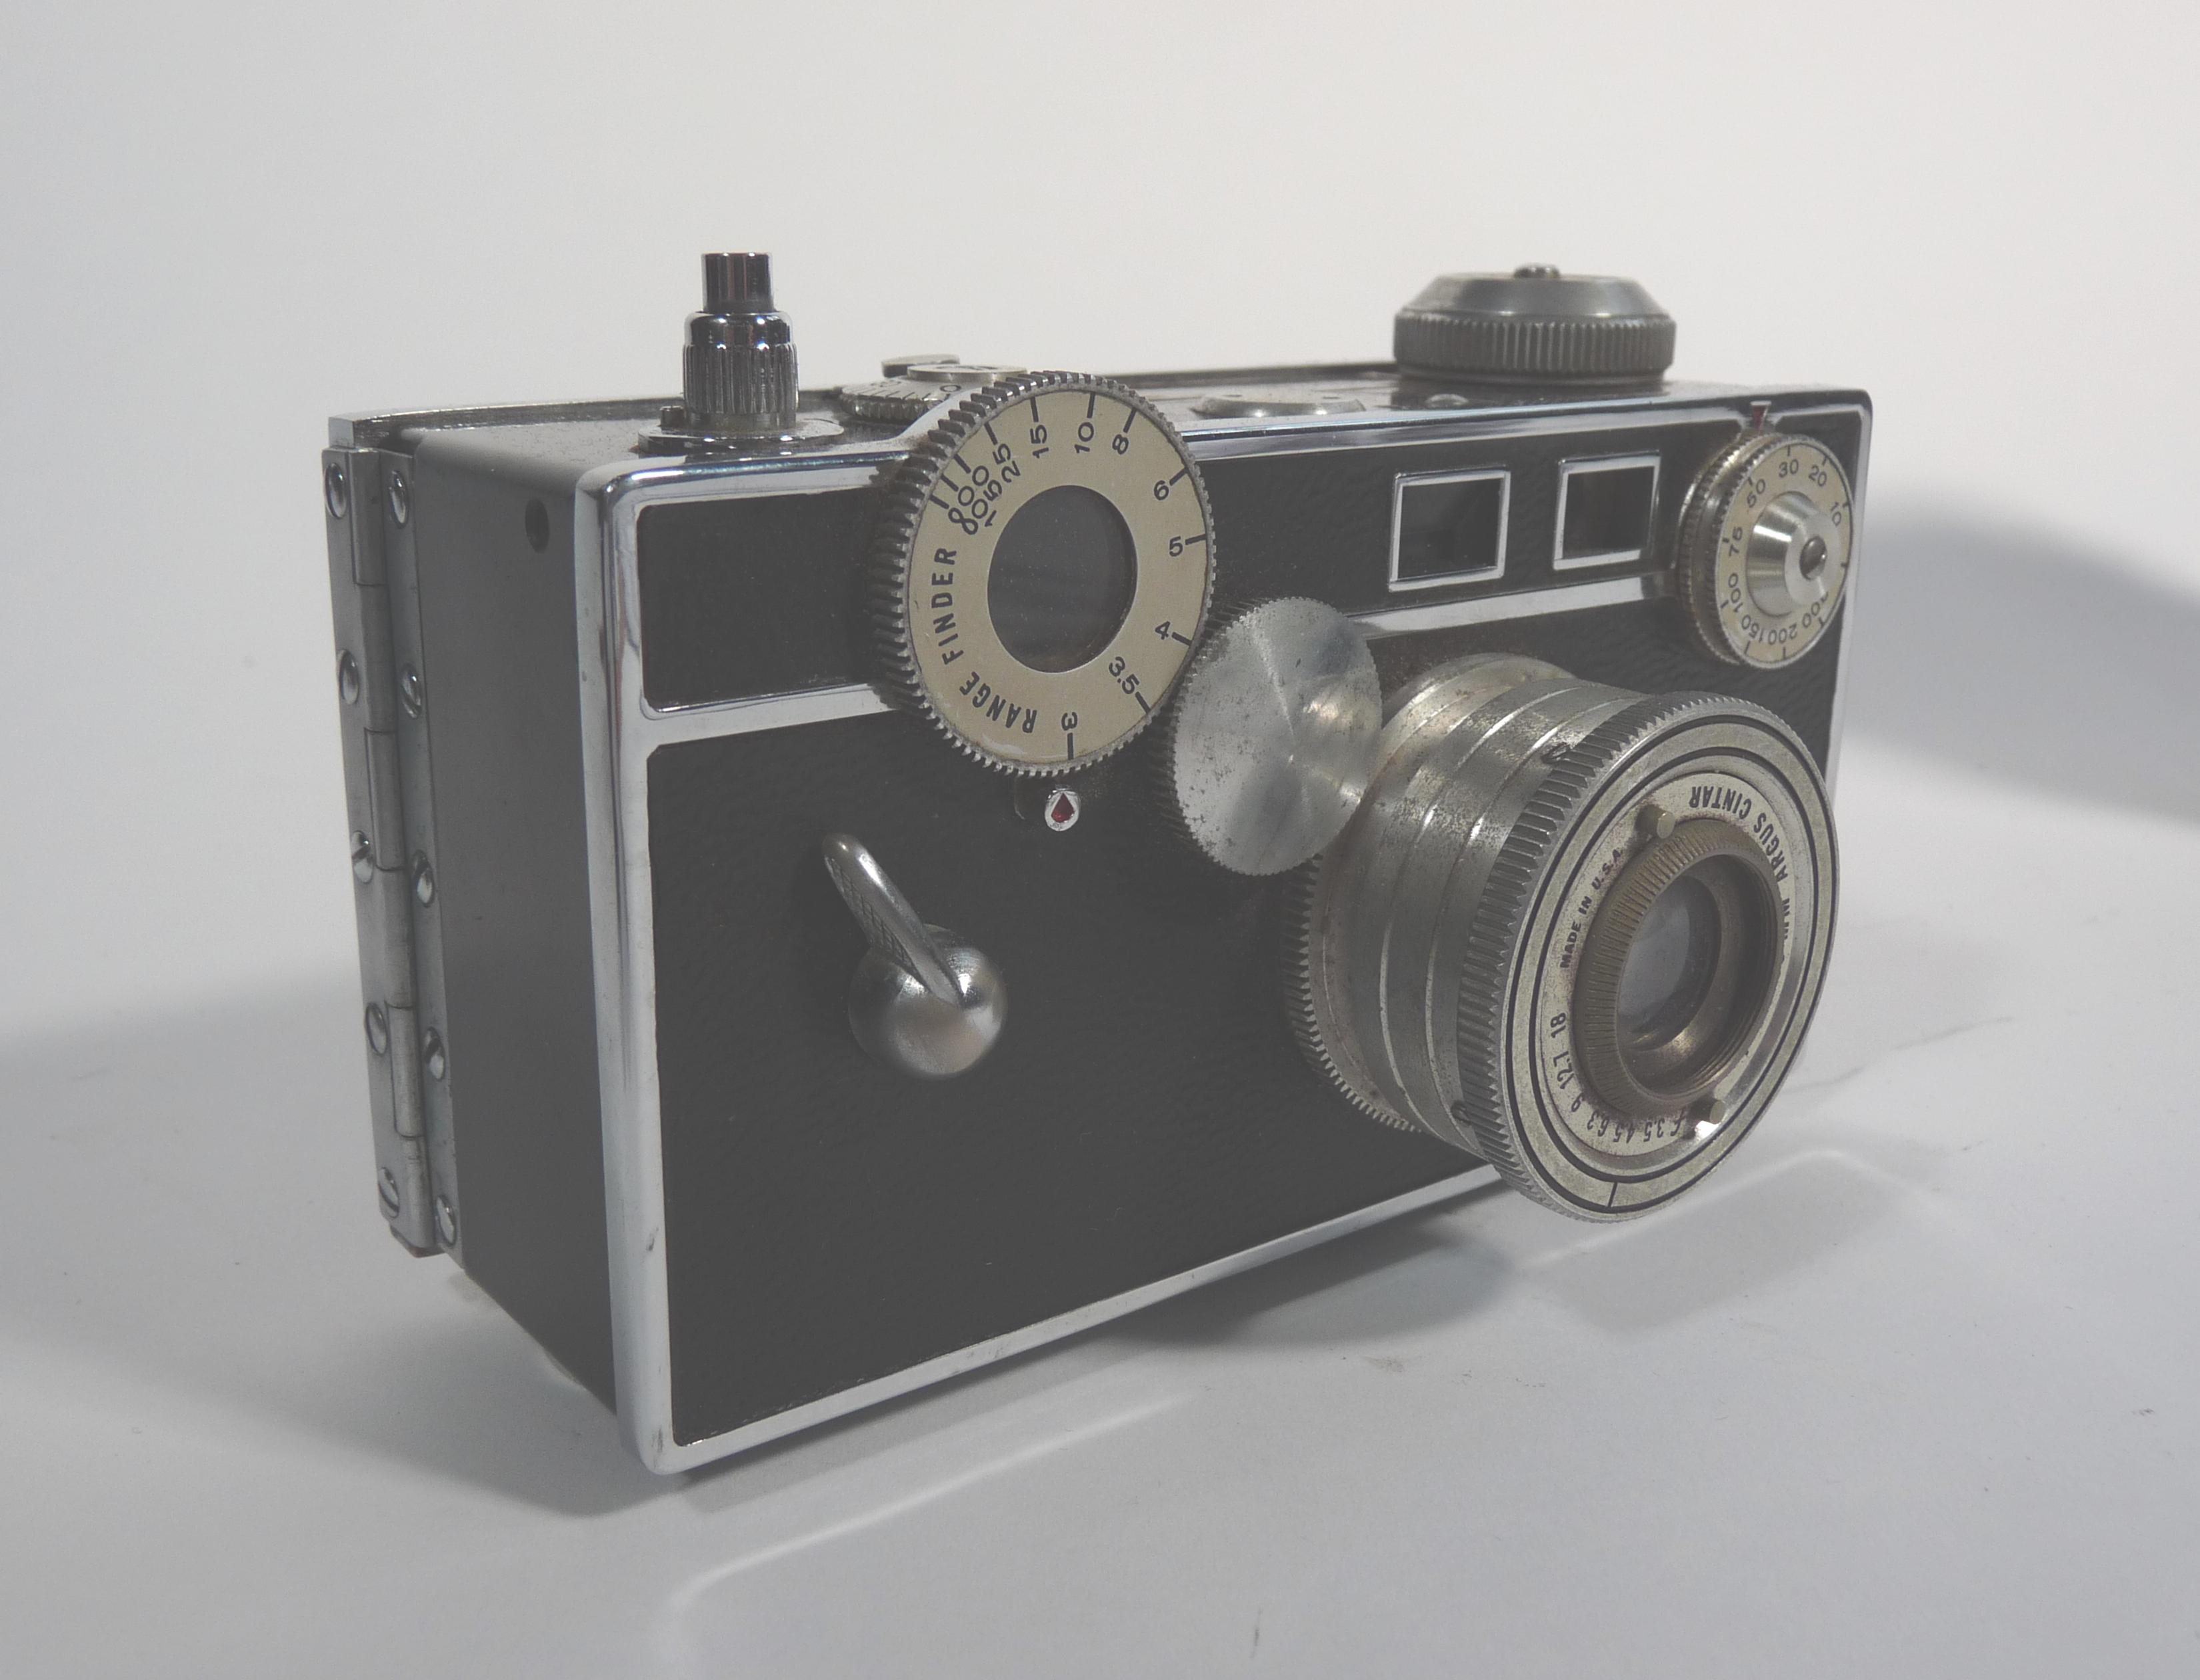 Argus C3 - - The free camera encyclopedia